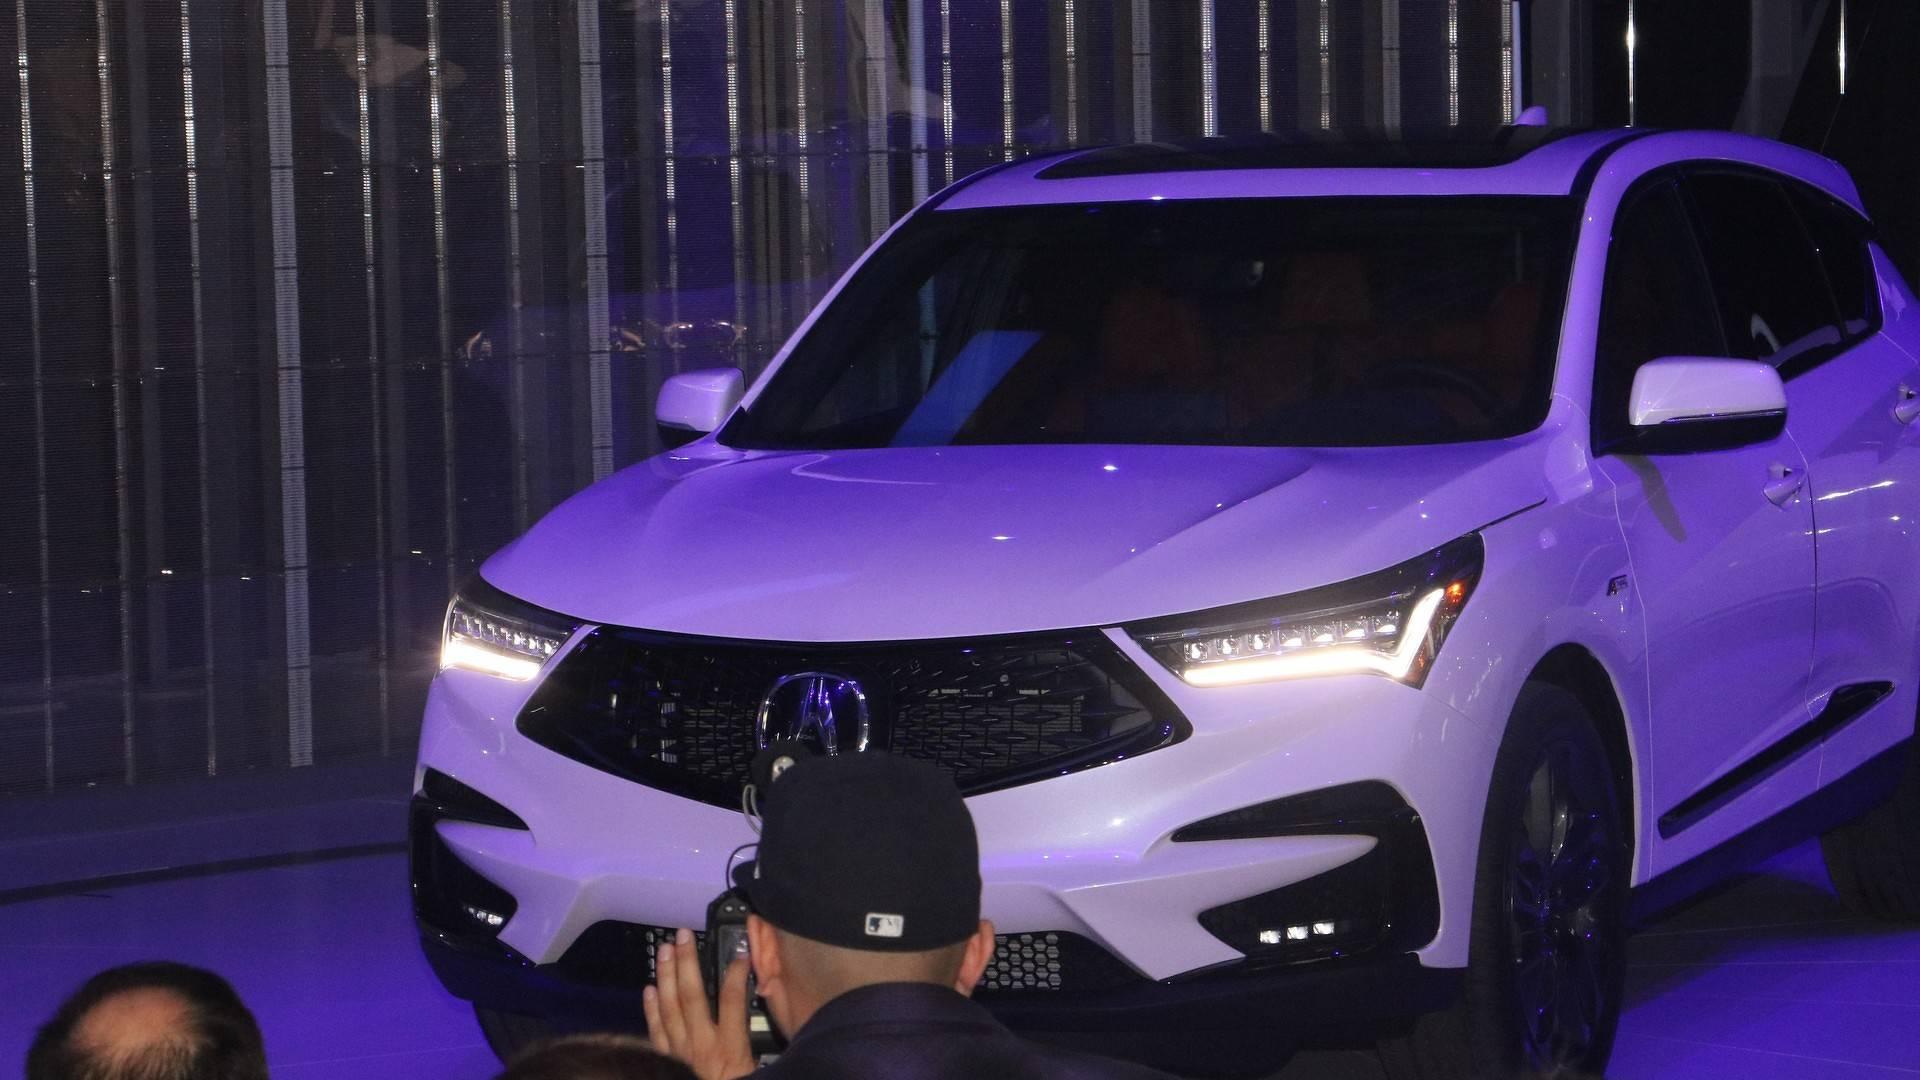 2019 Acura Rdx Rides On New Platform Not Related To Honda Cr V